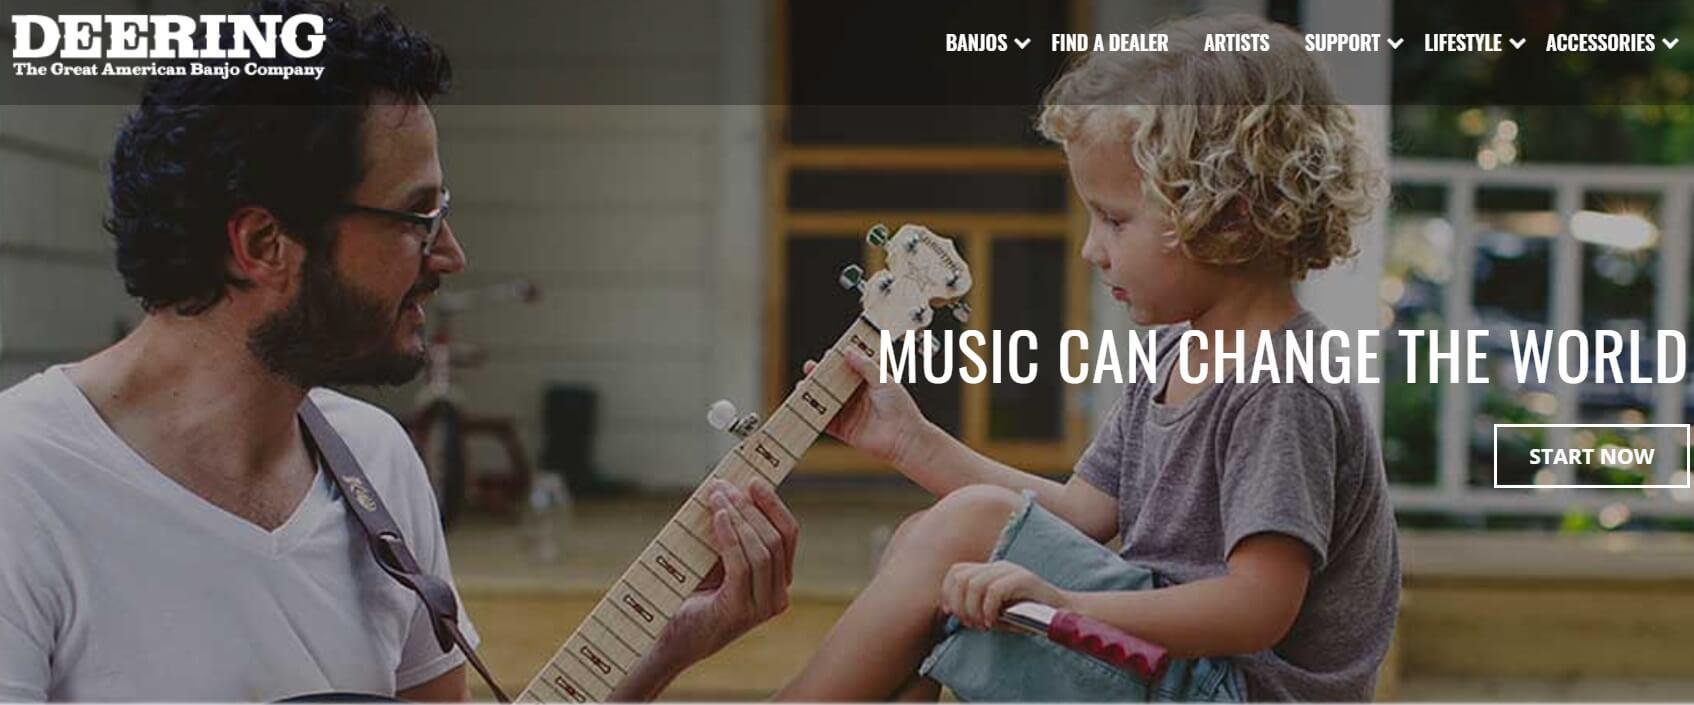 Deering online music banjo community with online banjo lessons